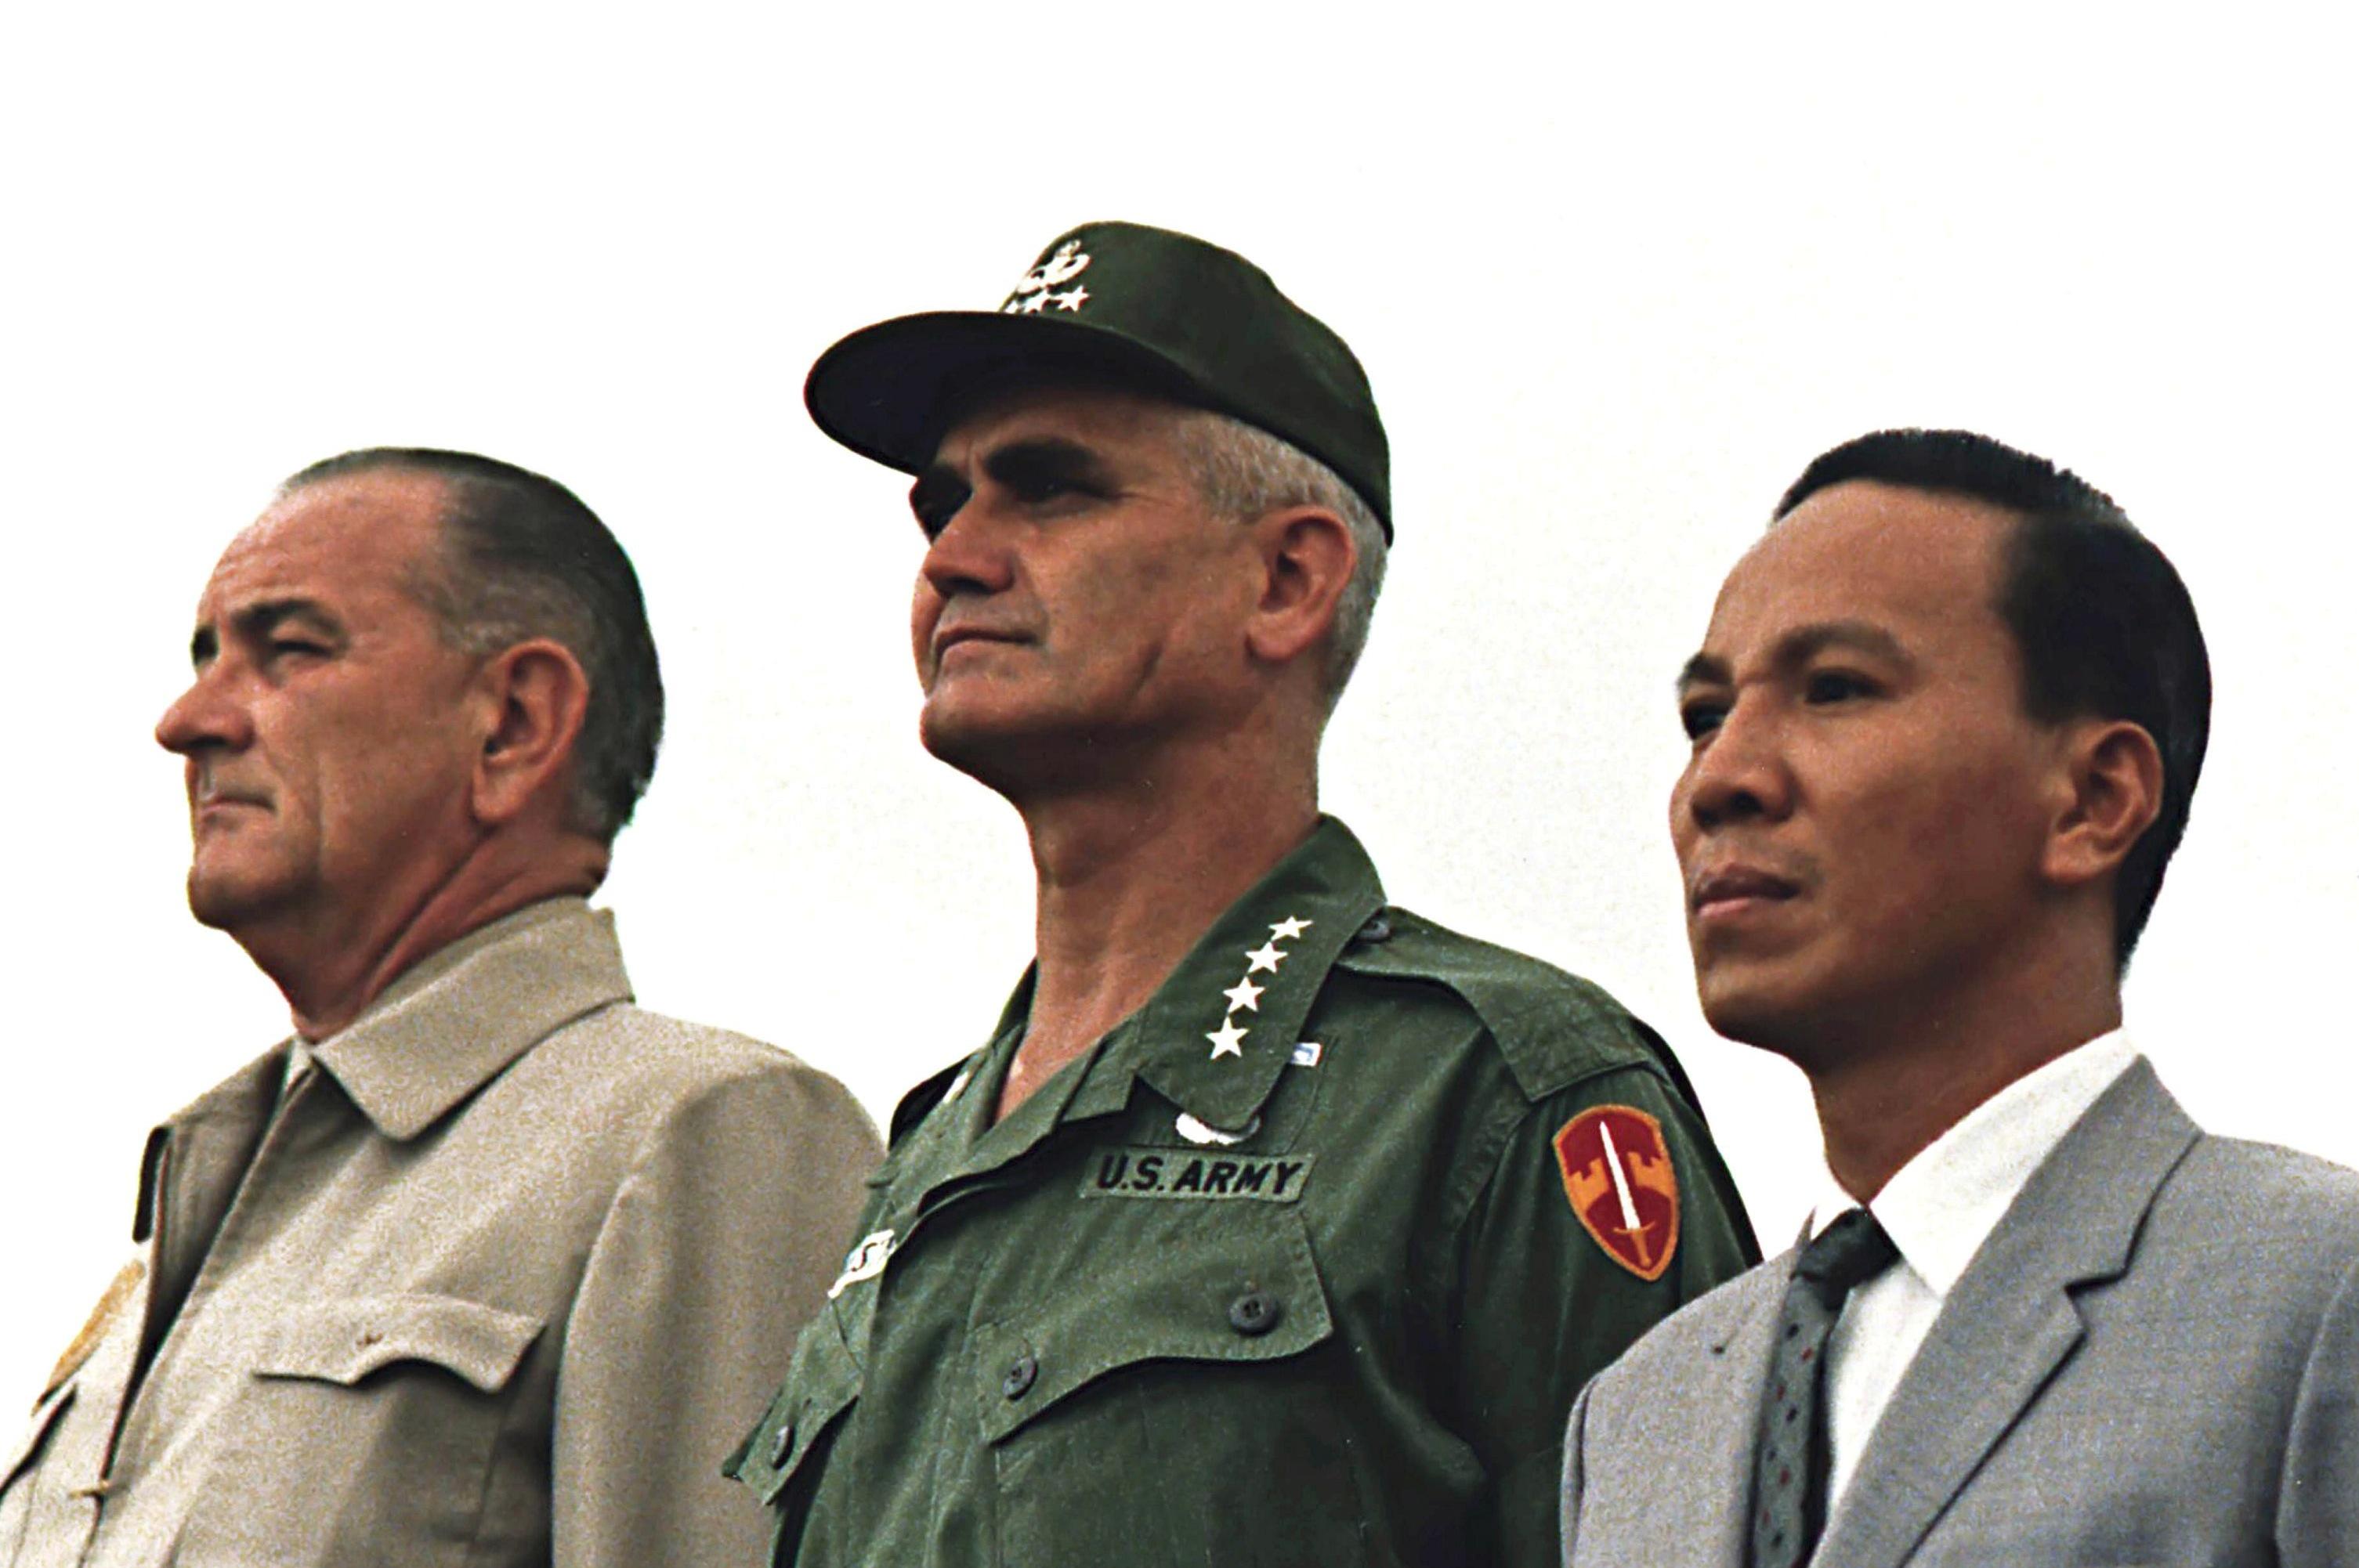 President Johnson, U.S. Army General William Westmoreland, and Vietnamese General Nguyen Van Thieu in 1967.